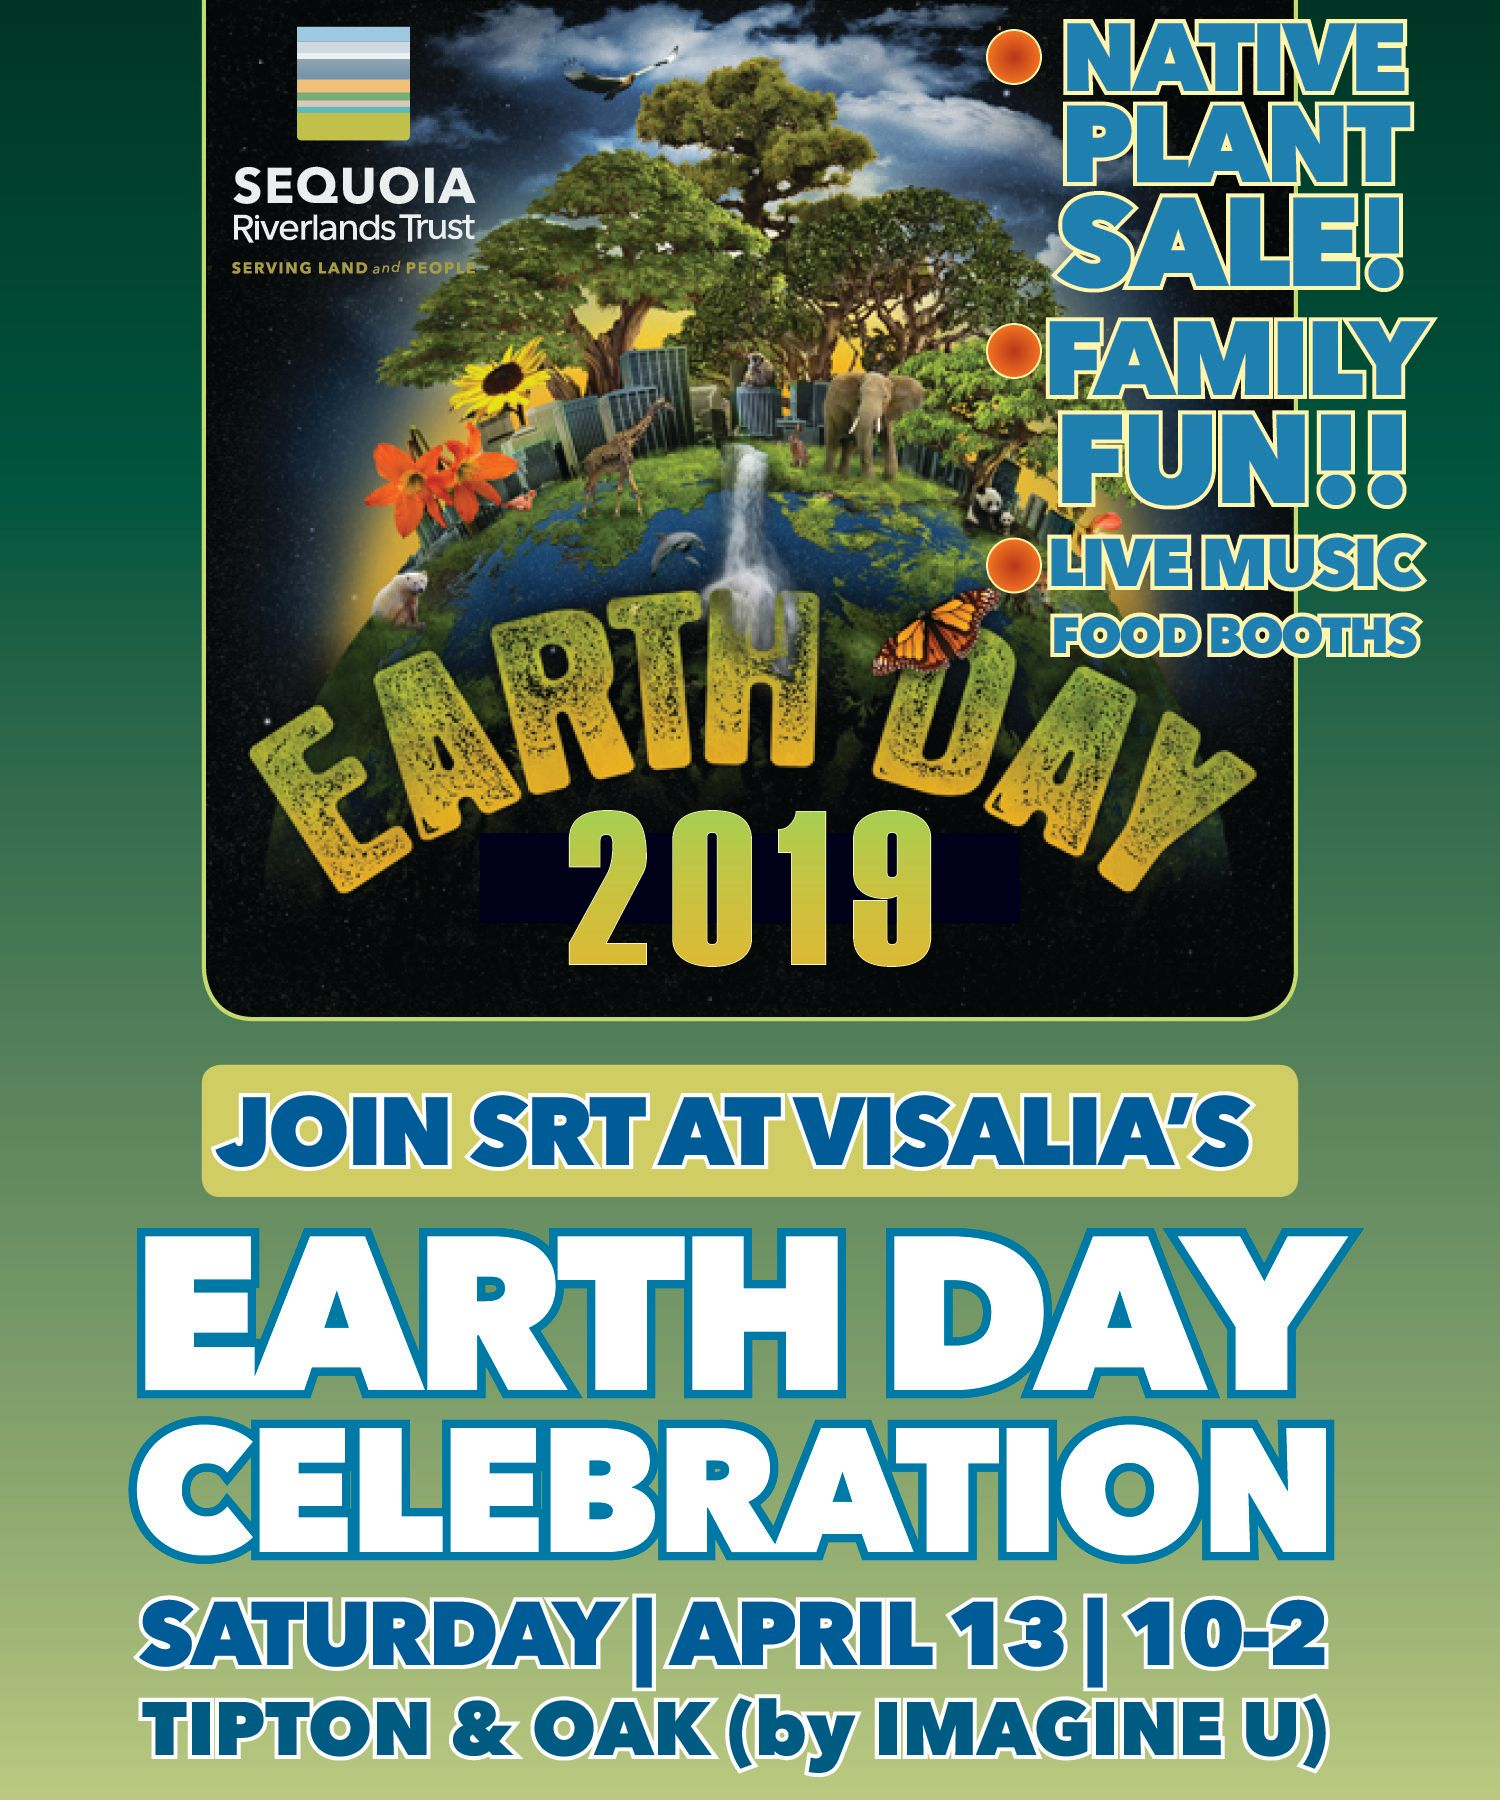 SRT at Visalia Earth Day event